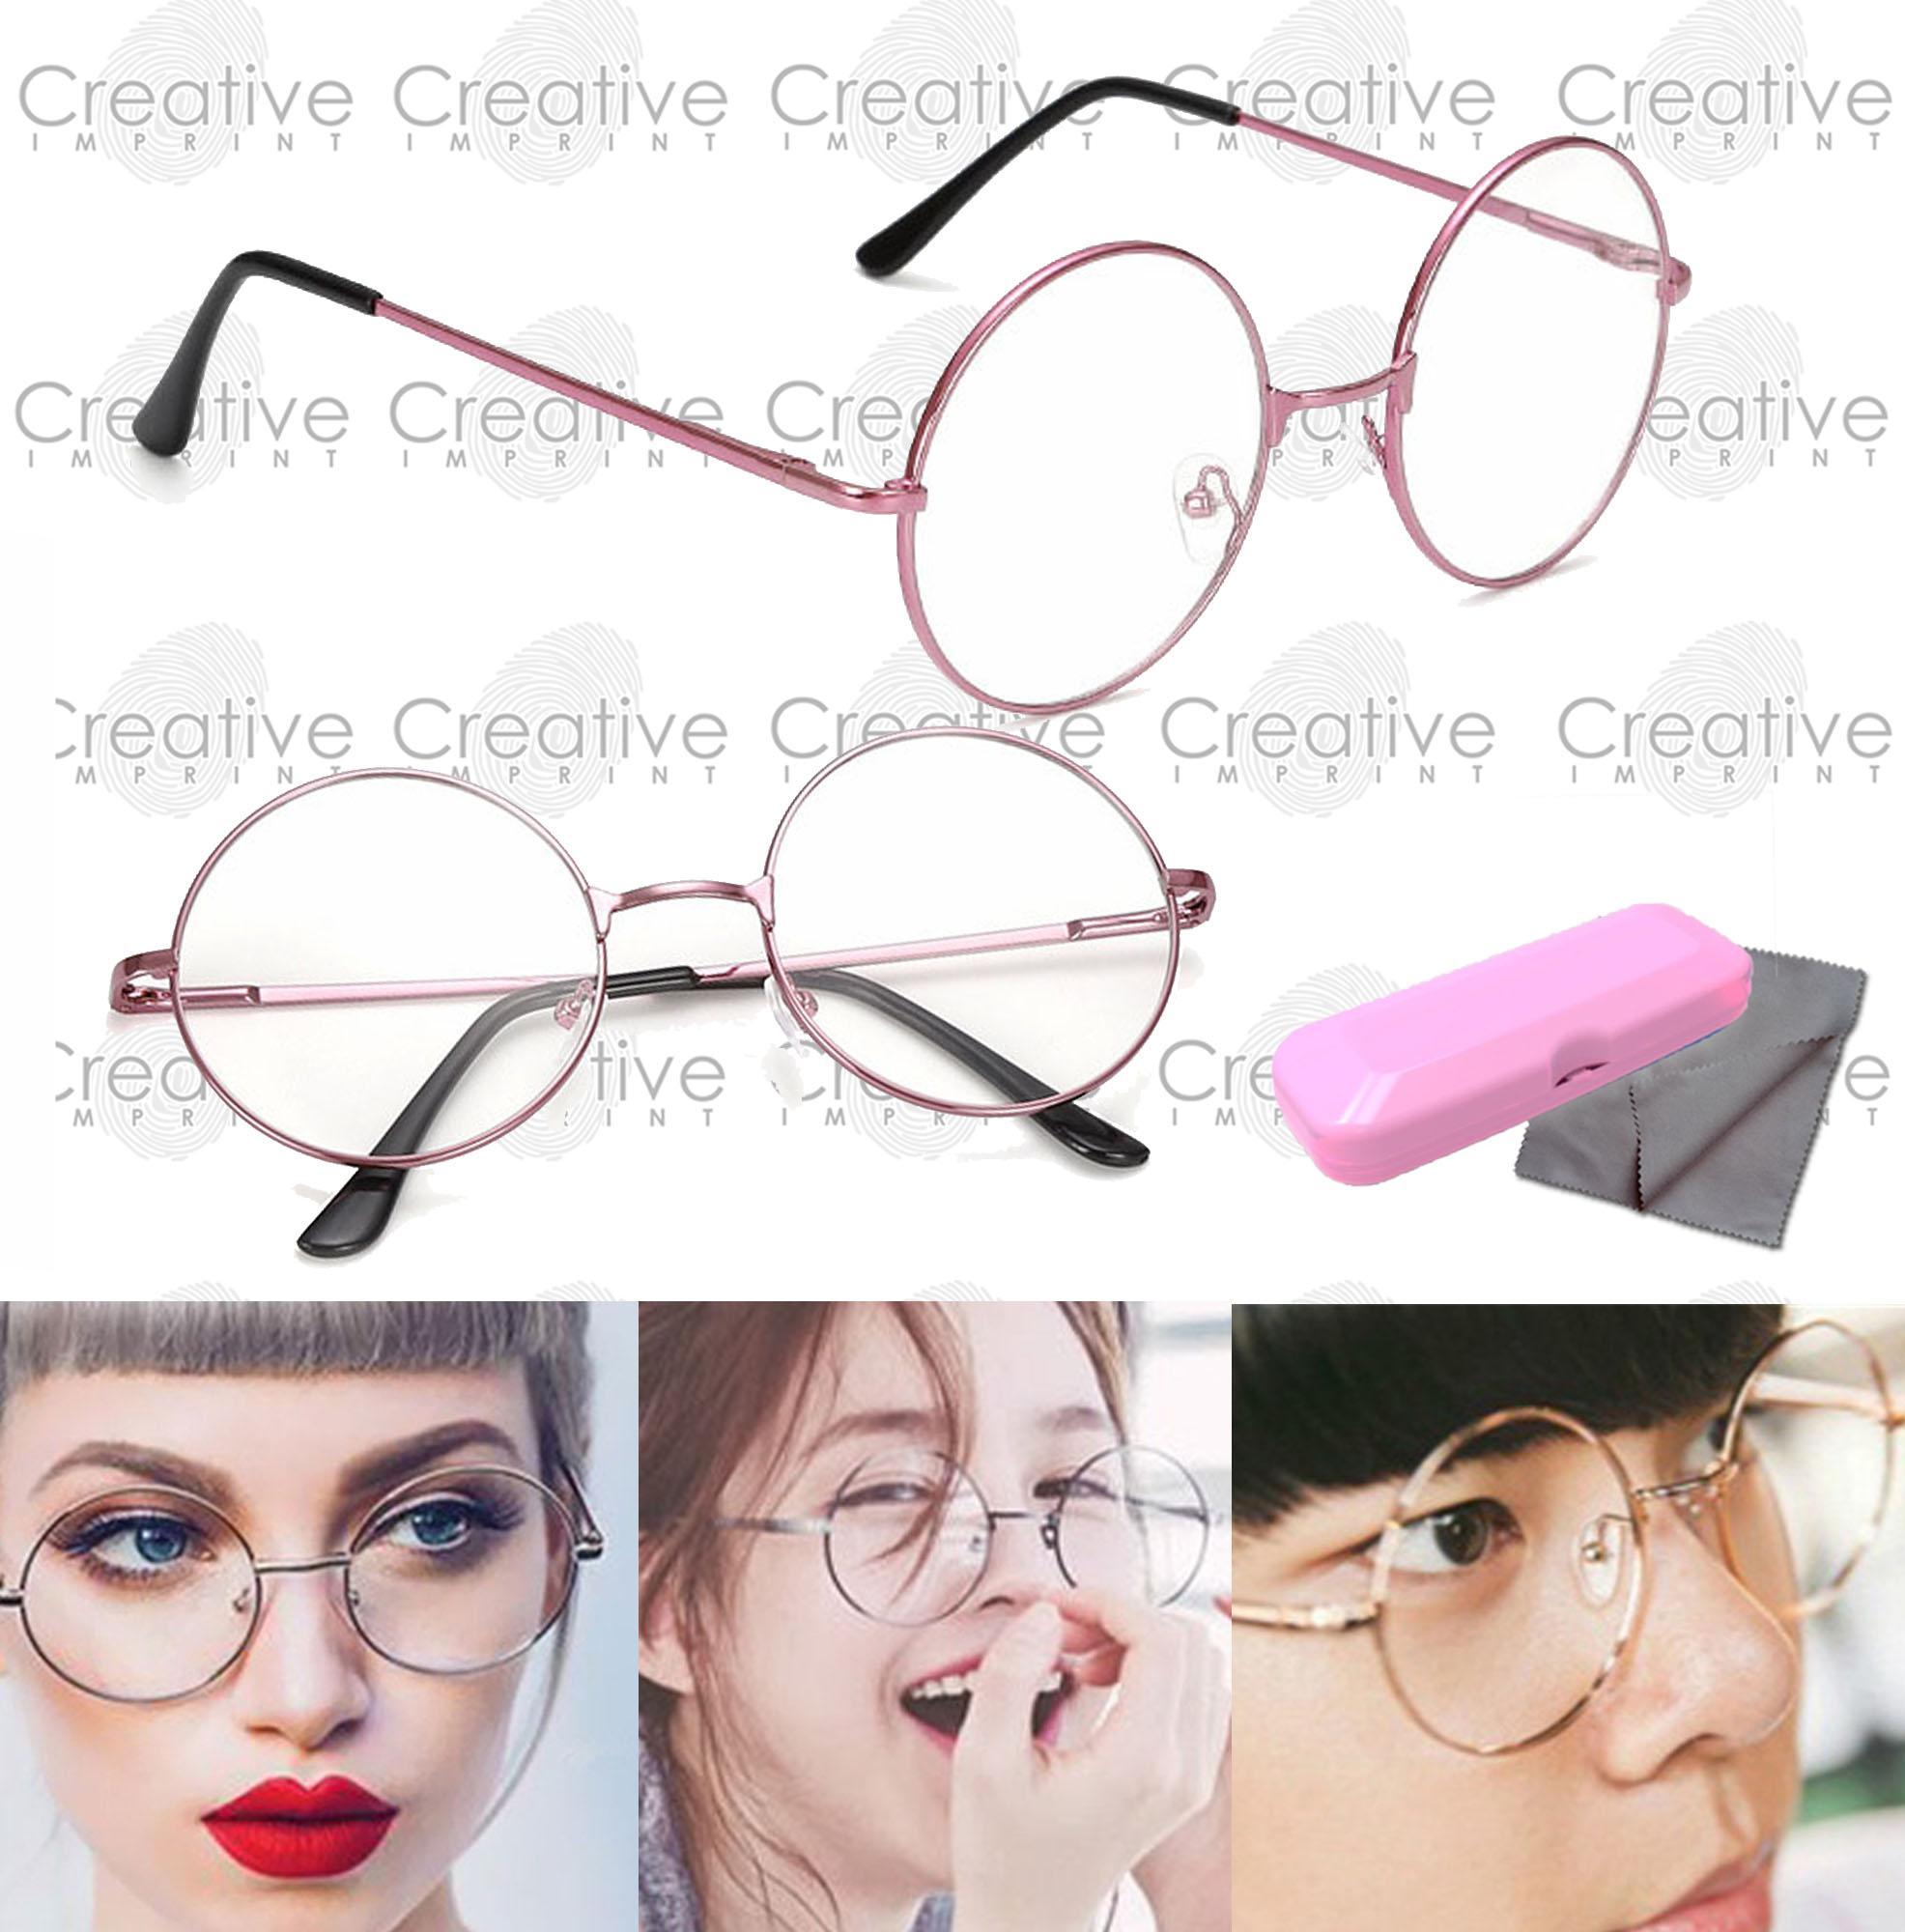 cb3bb9e5a Creative Imprint Retro Round Clear Specs (Pink Frame) Flat Lens Eyeglass  Trendy Harry Potter